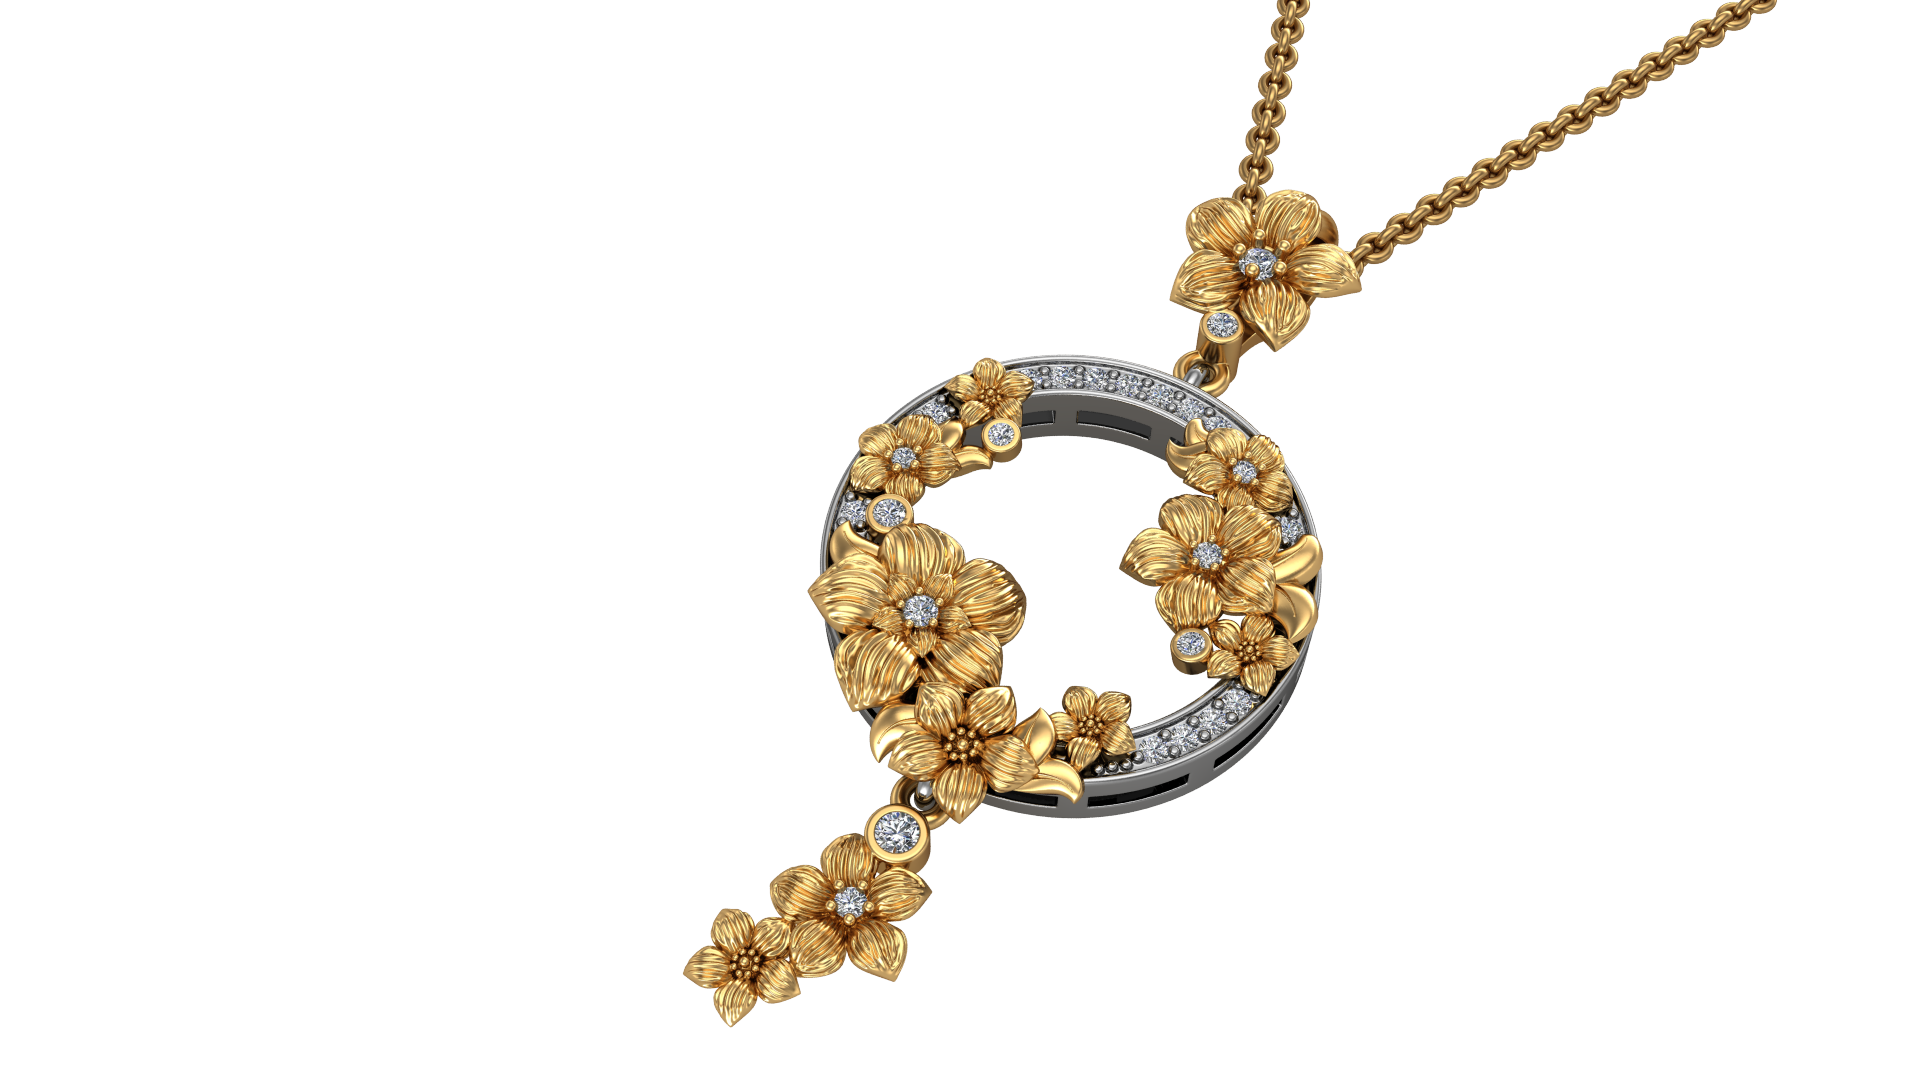 Jewelry Modeling - Cad Jewelry 3D Model - Rhino, Zbrush ...